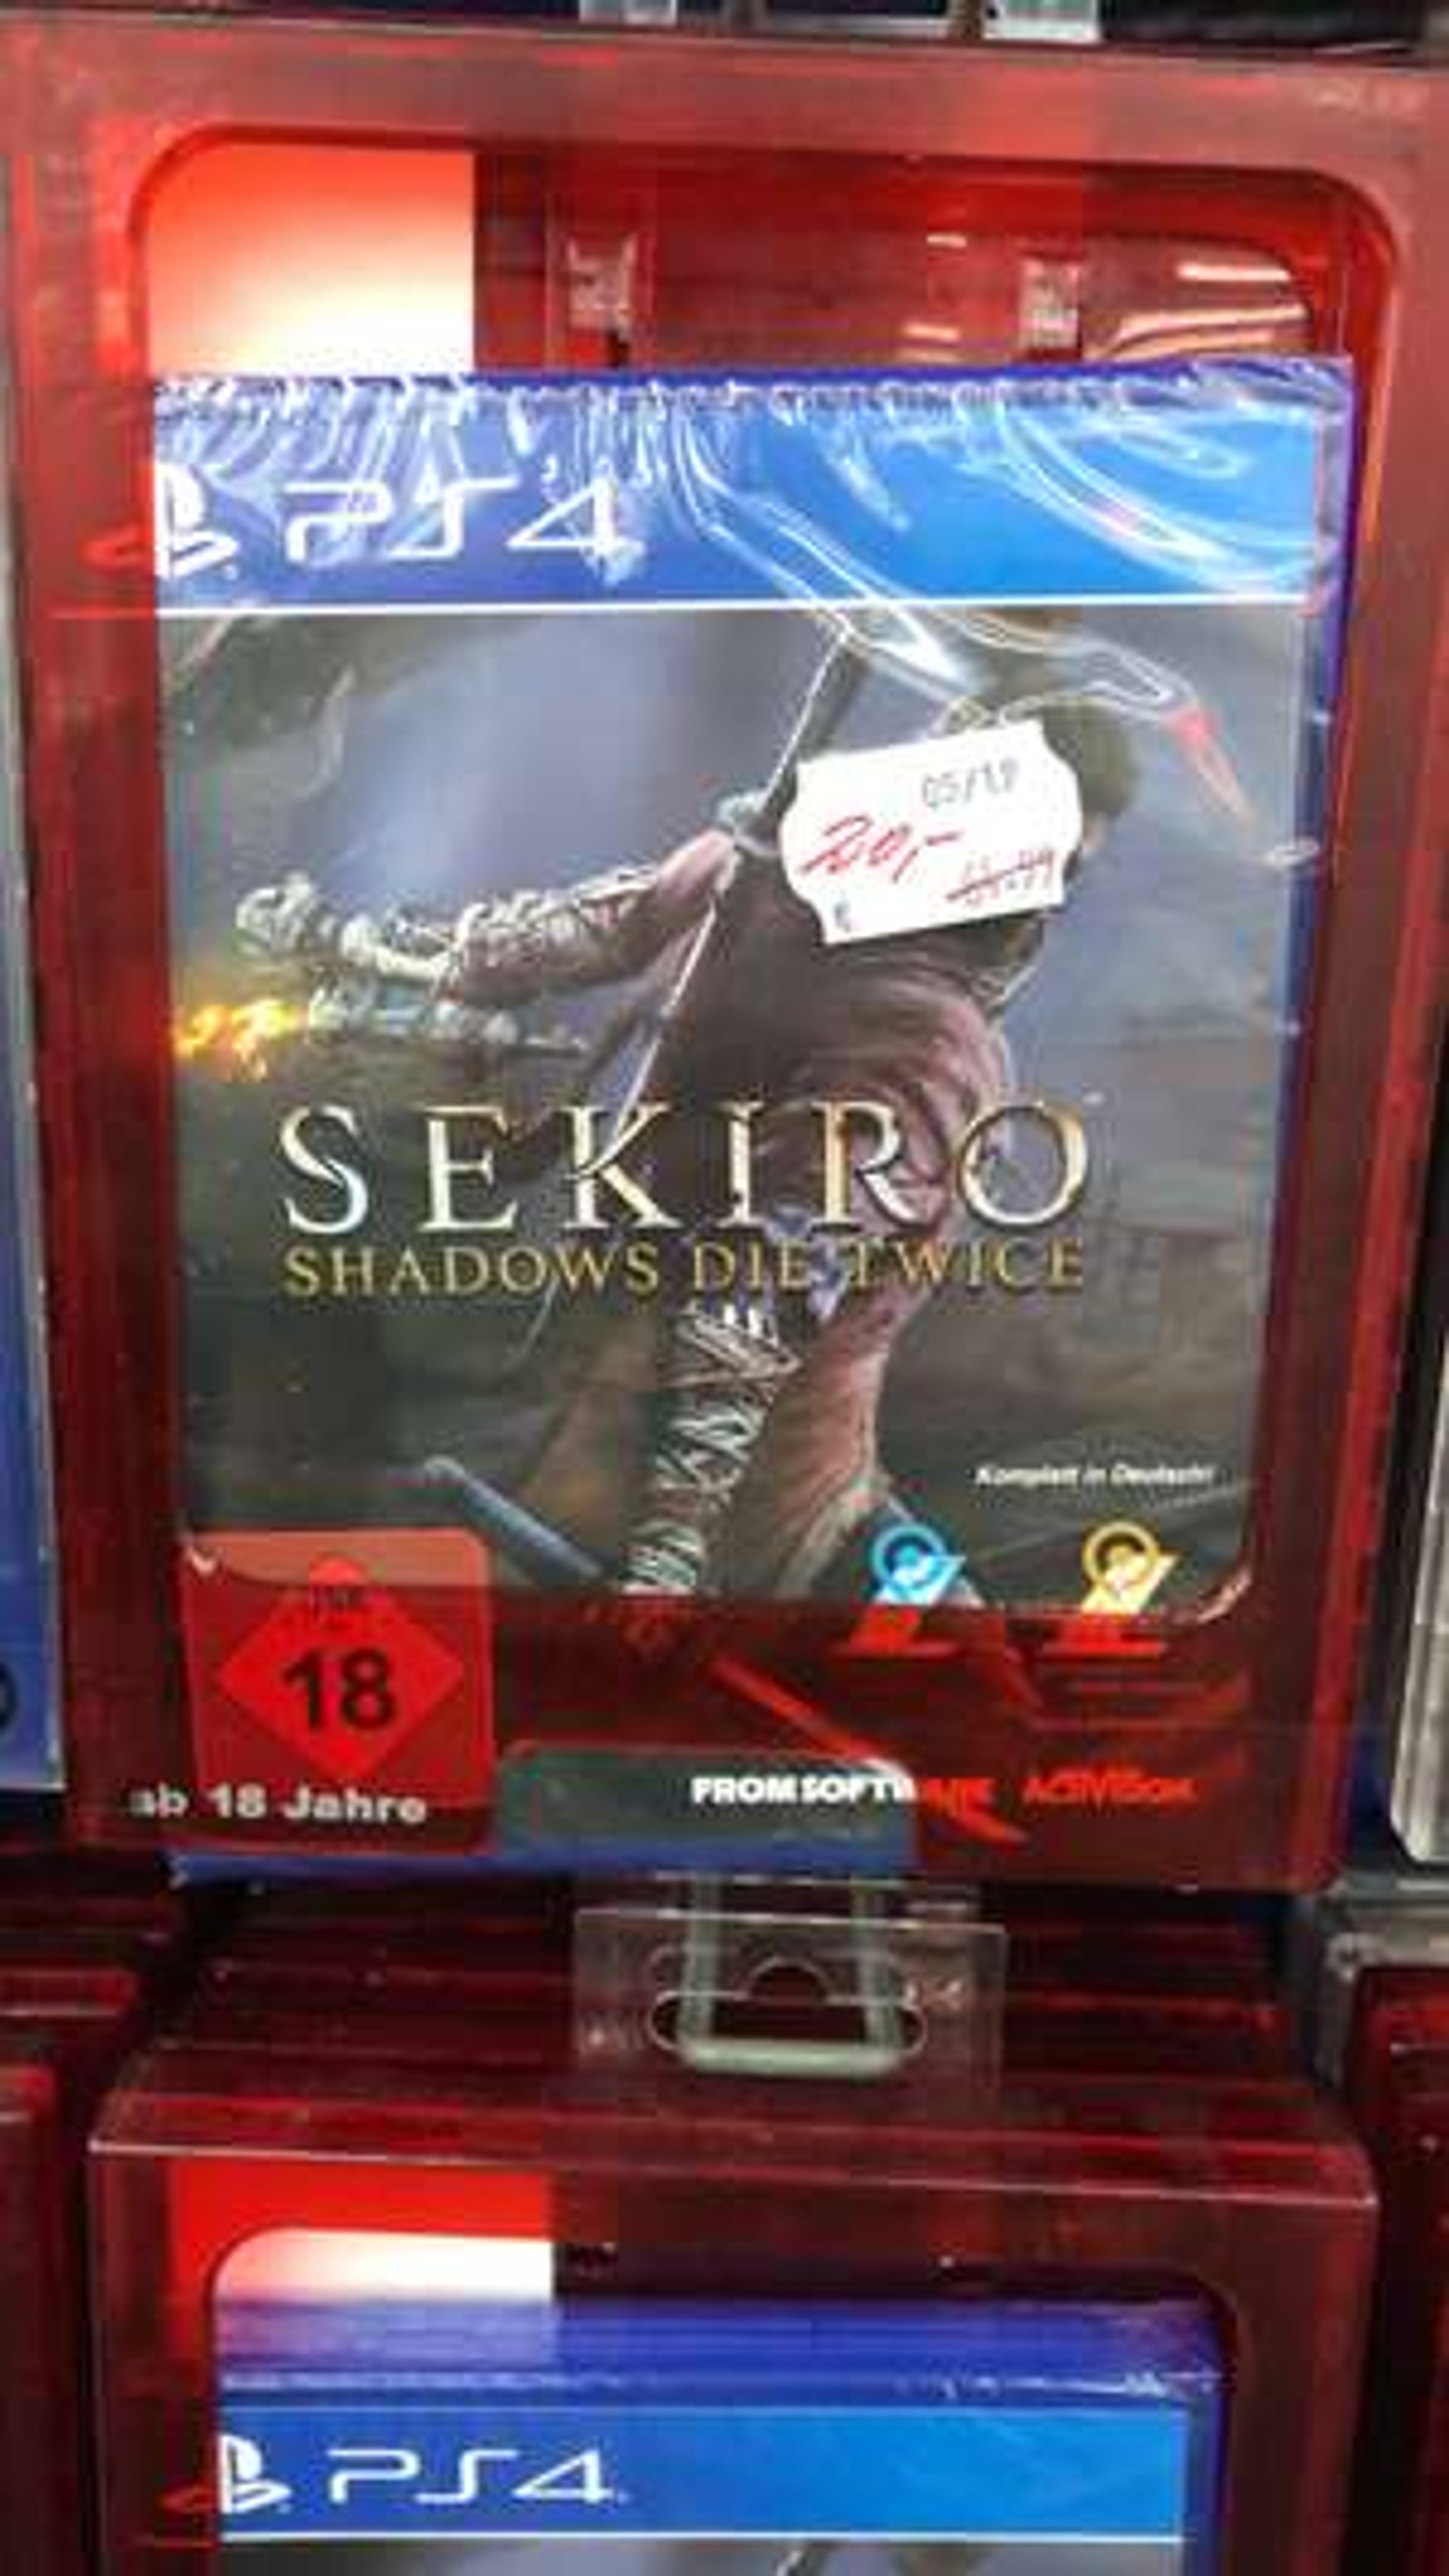 [LOKAL] Saturn Hannover Innenstadt - Sekiro: Shadows Die Twice (PS4)